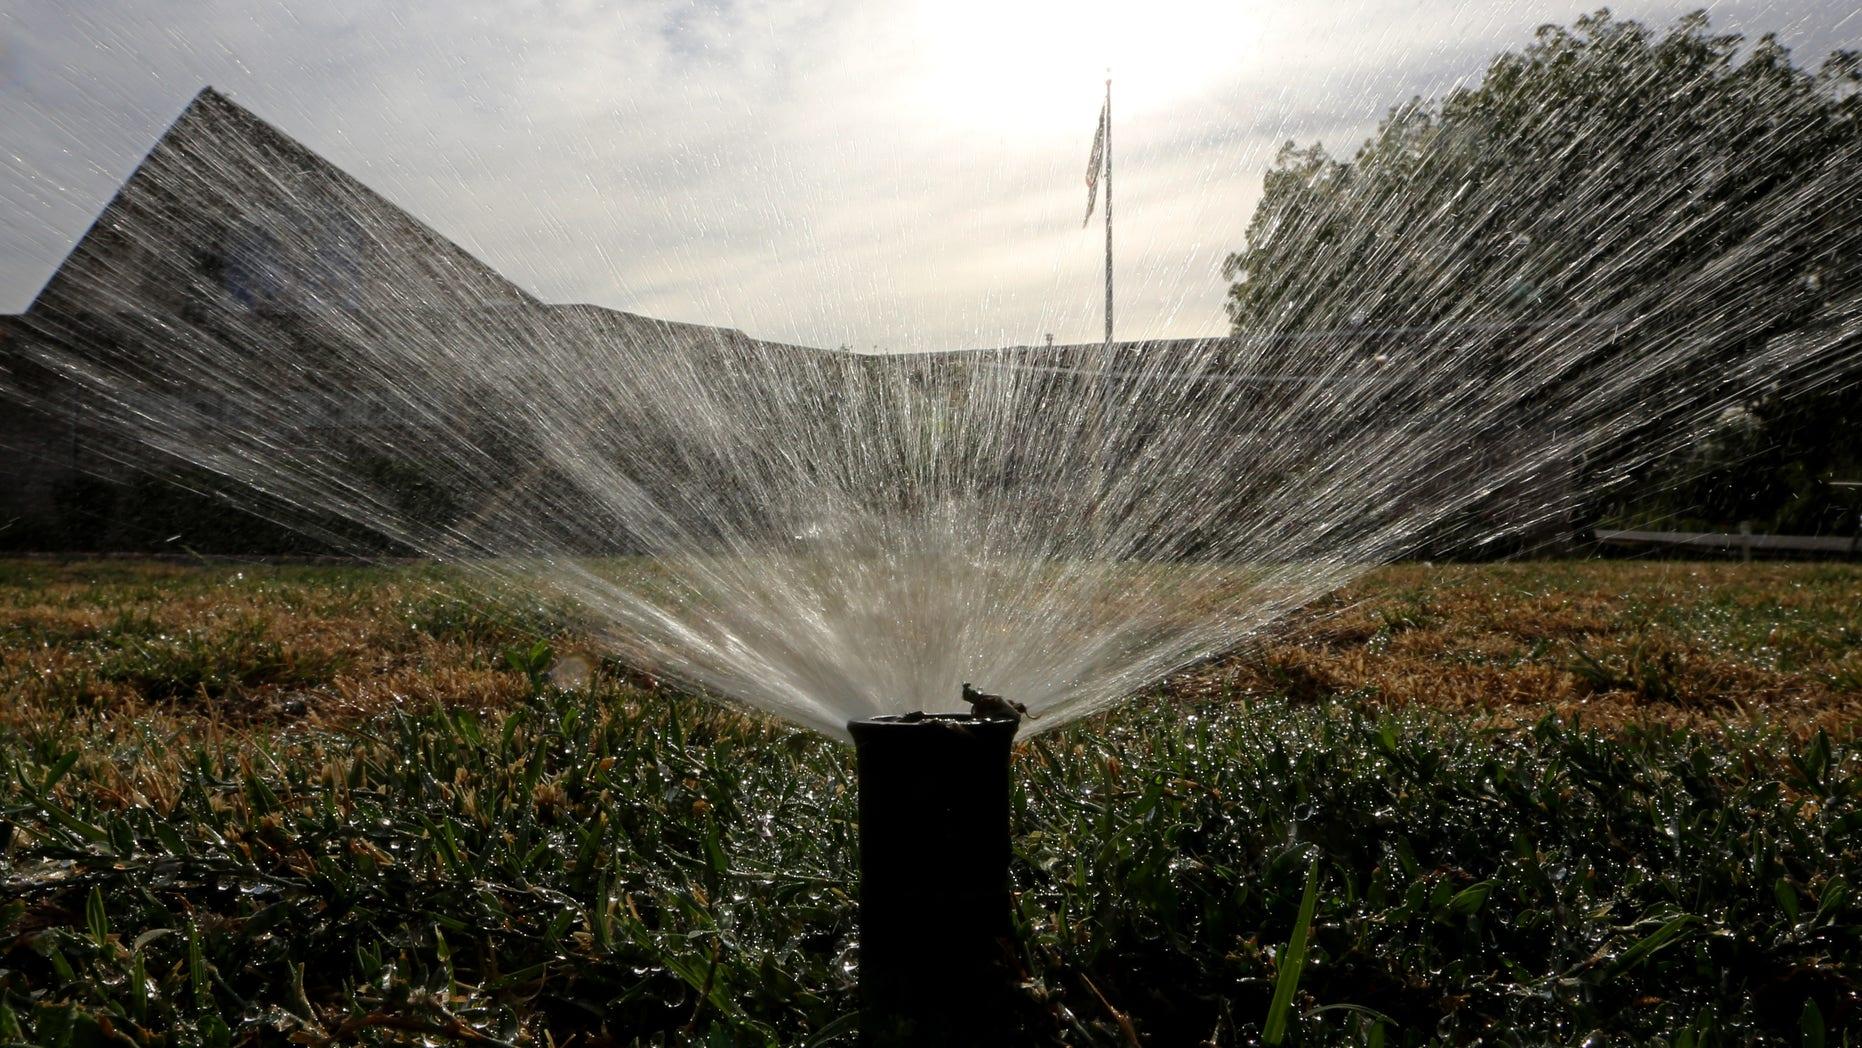 FILE -- Sprinklers water a lawn in Sacramento, Calif.